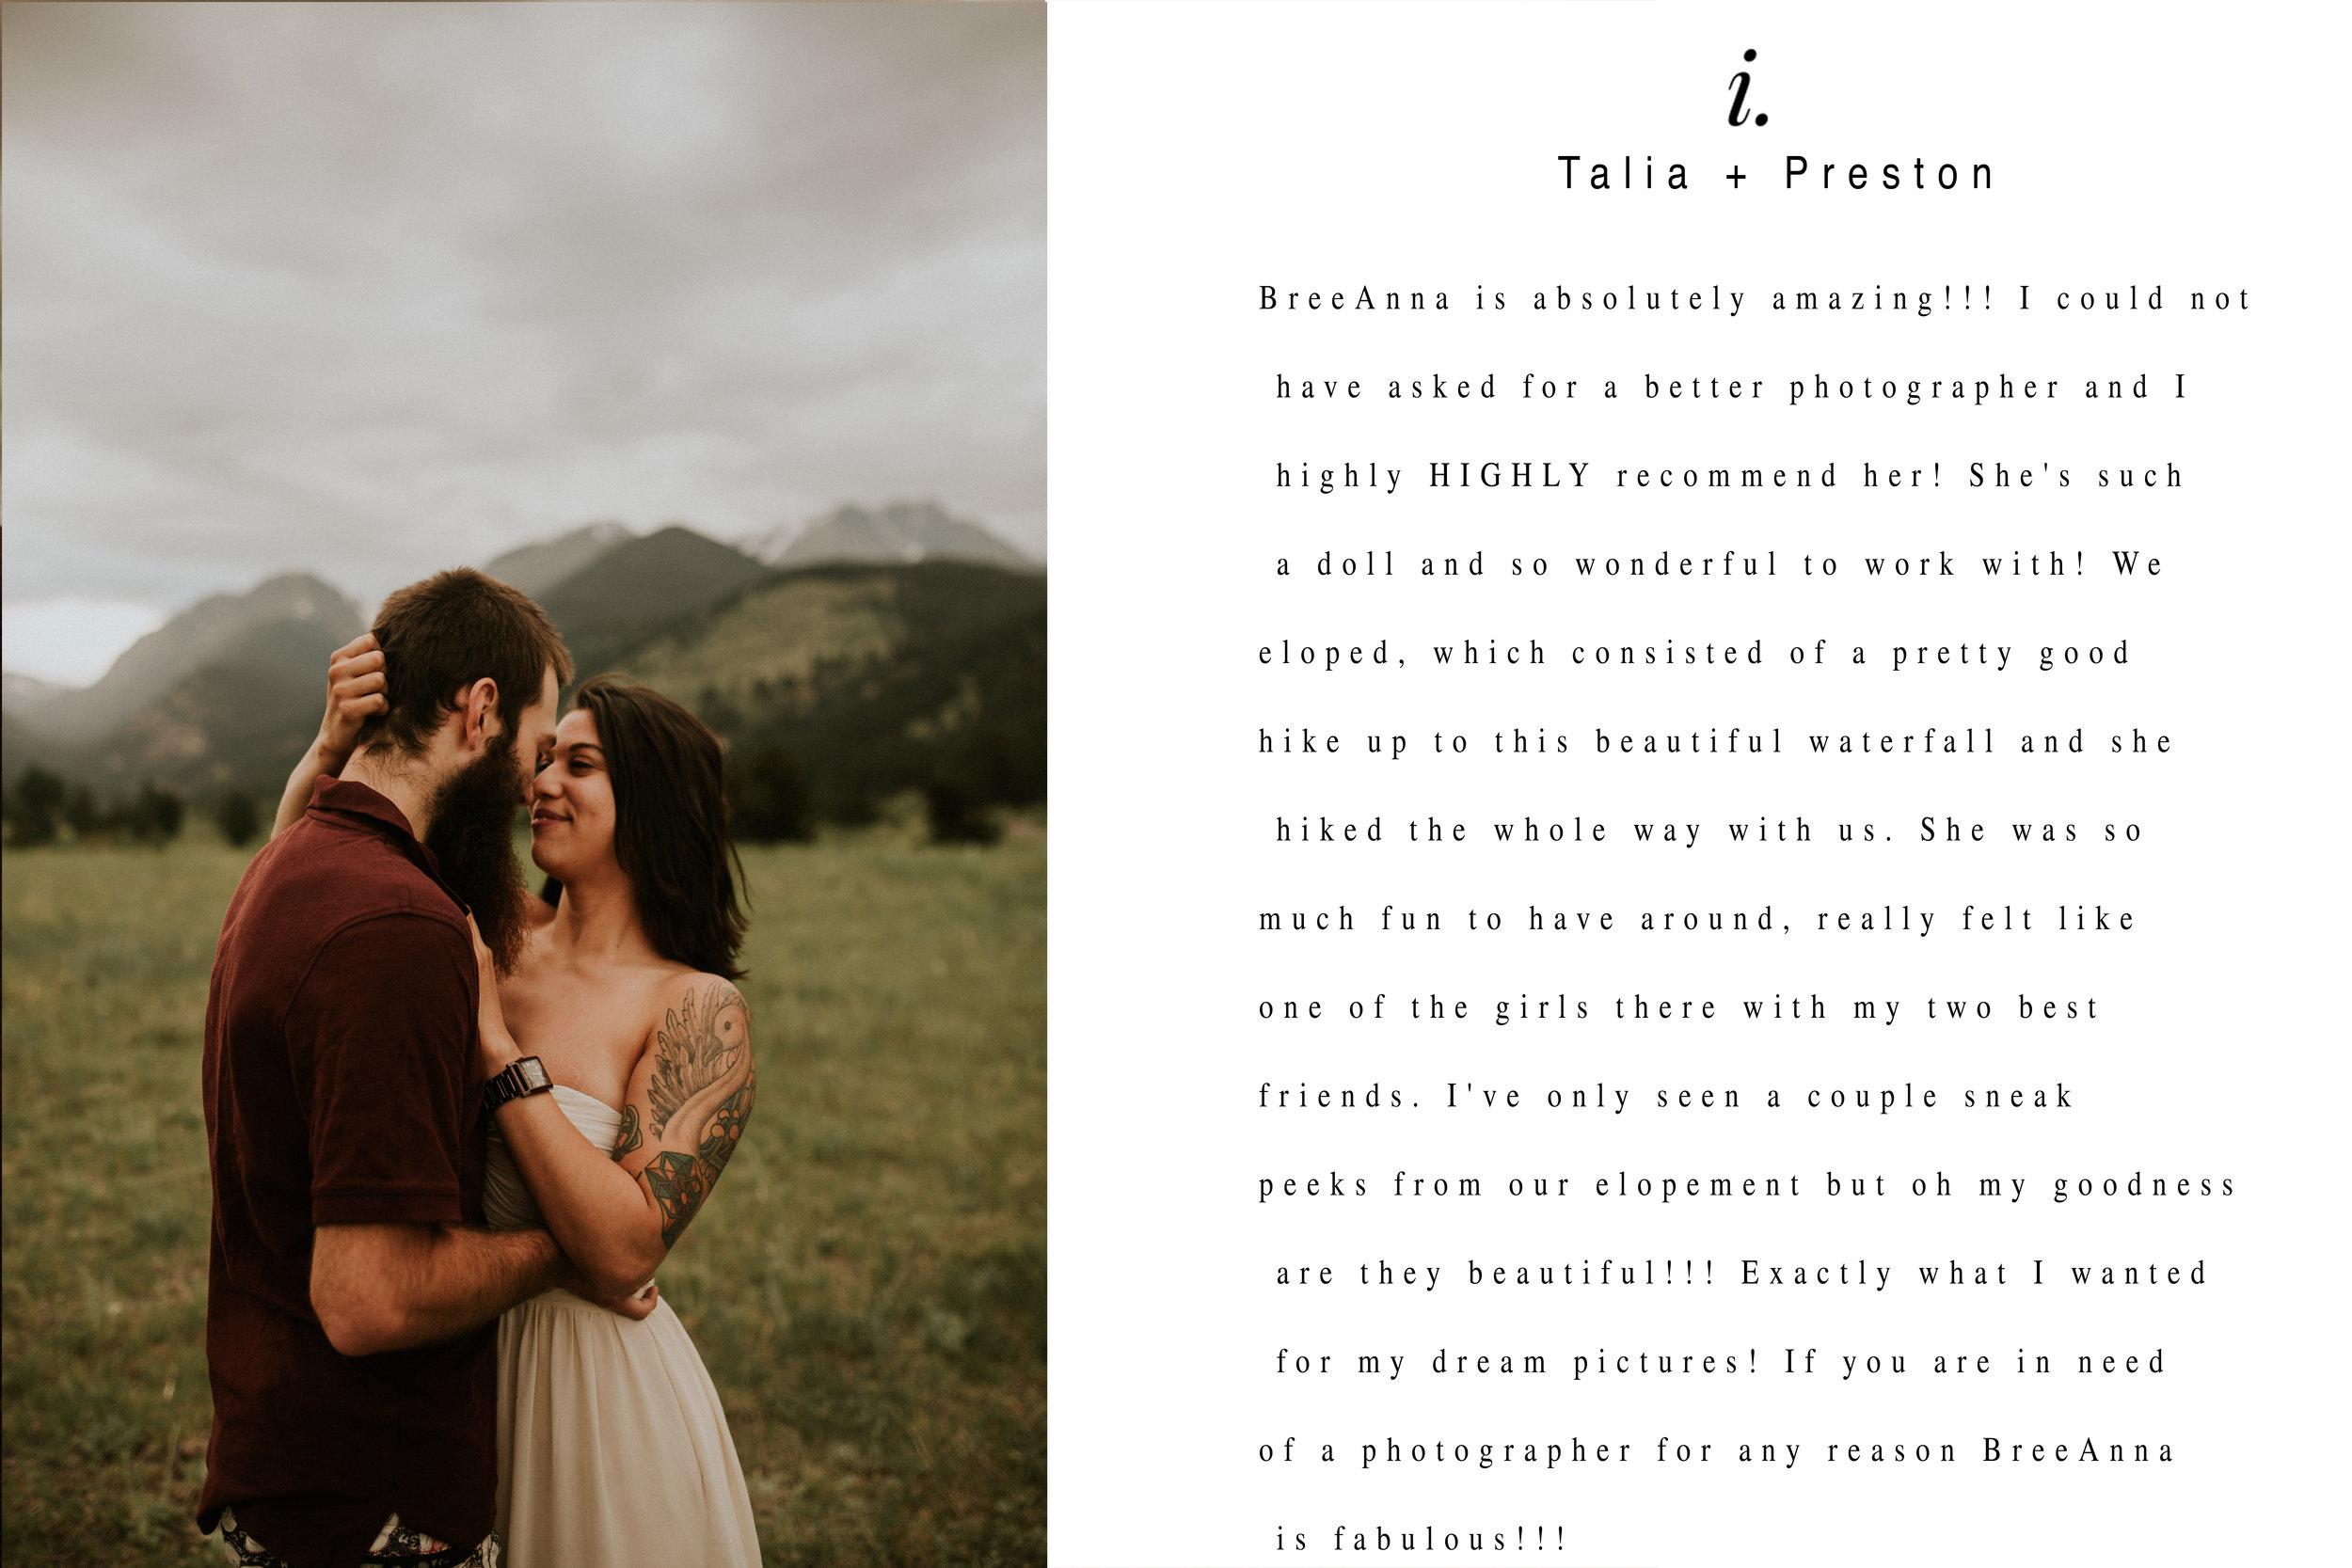 Mount-baker-artist-point-elopement-Ceremony-review 3.jpg